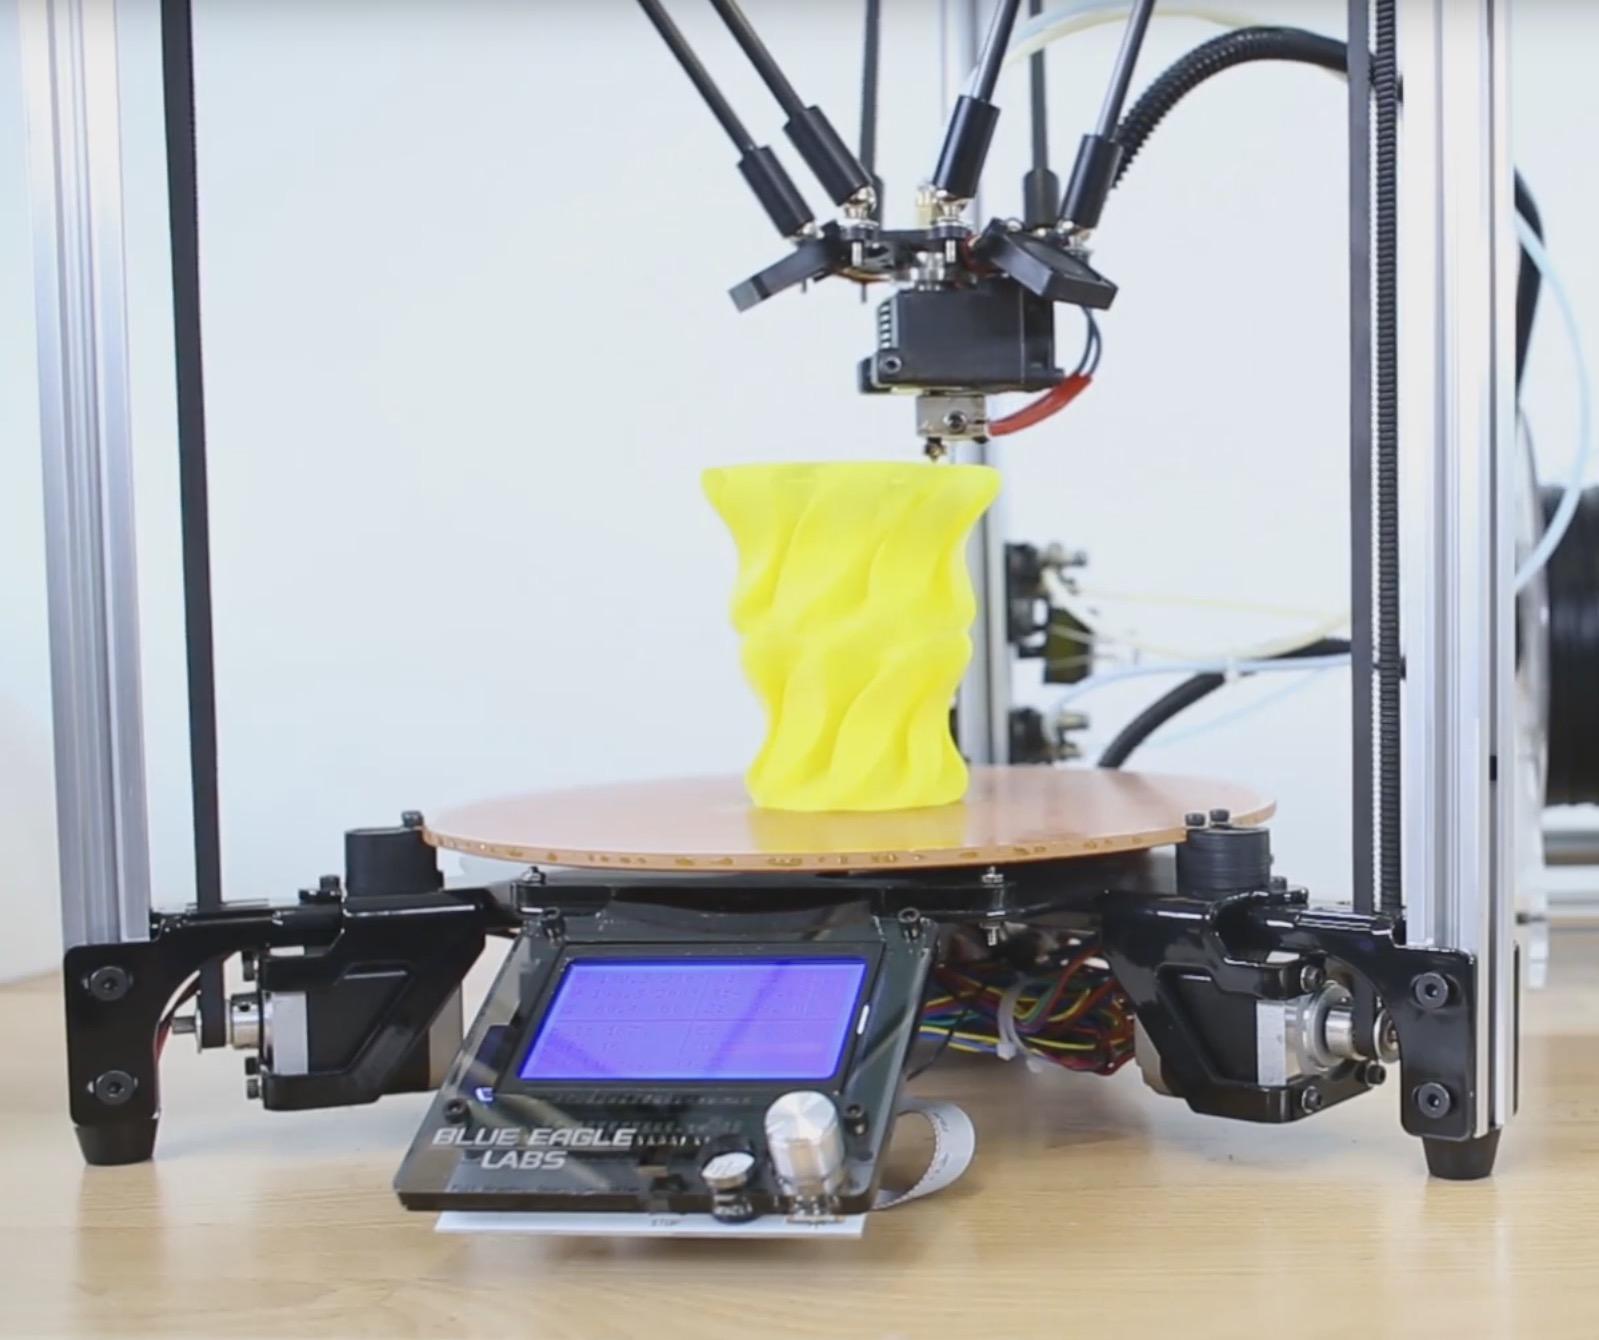 The Metal Delta is a Surprisingly Good 3D Printer Option